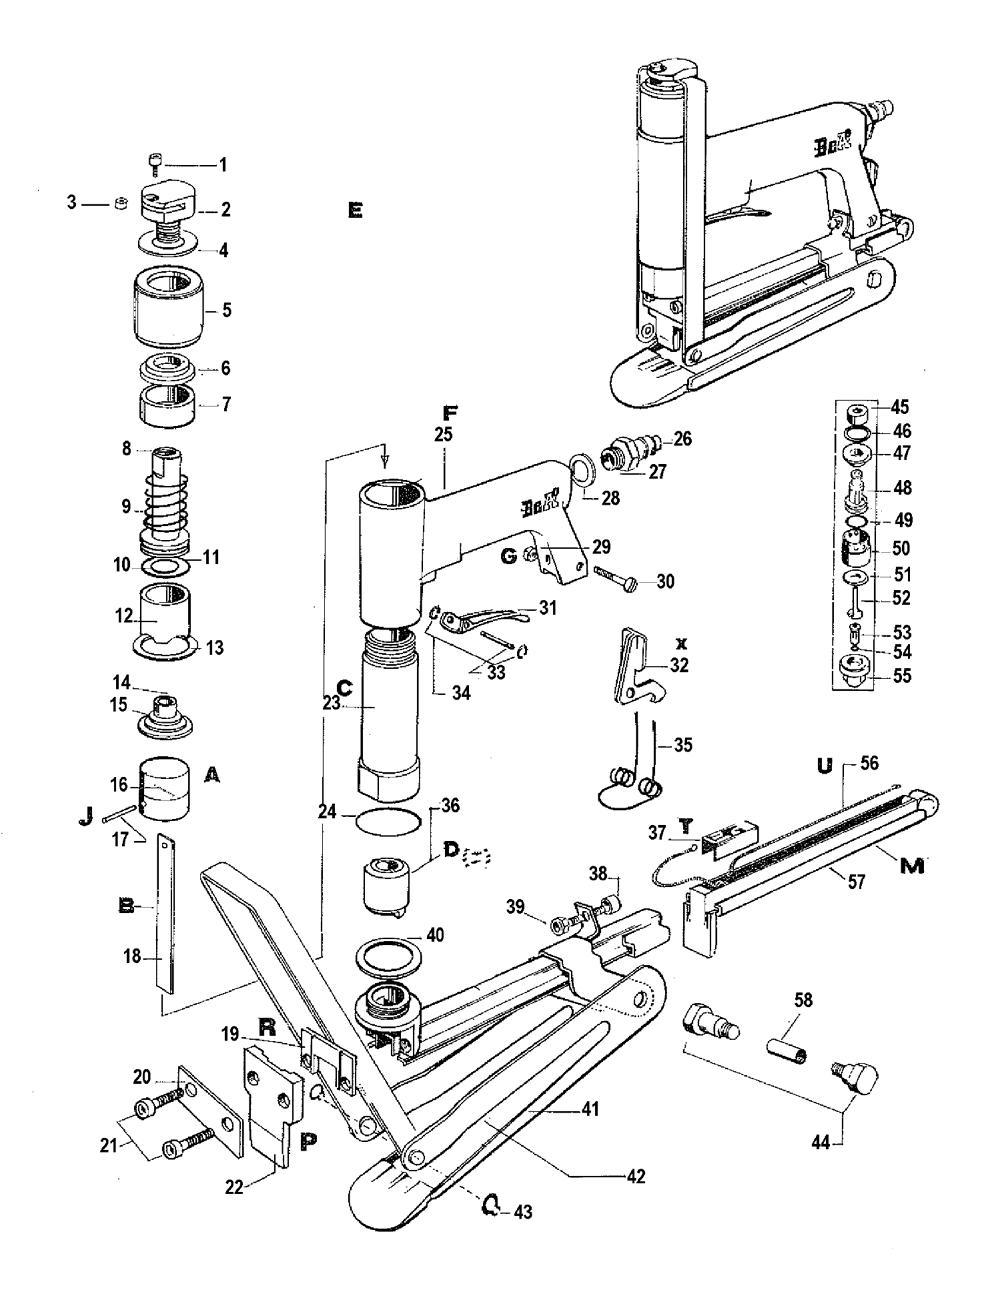 Pneumatic Stapler Diagram Pneumatic Get Free Image About